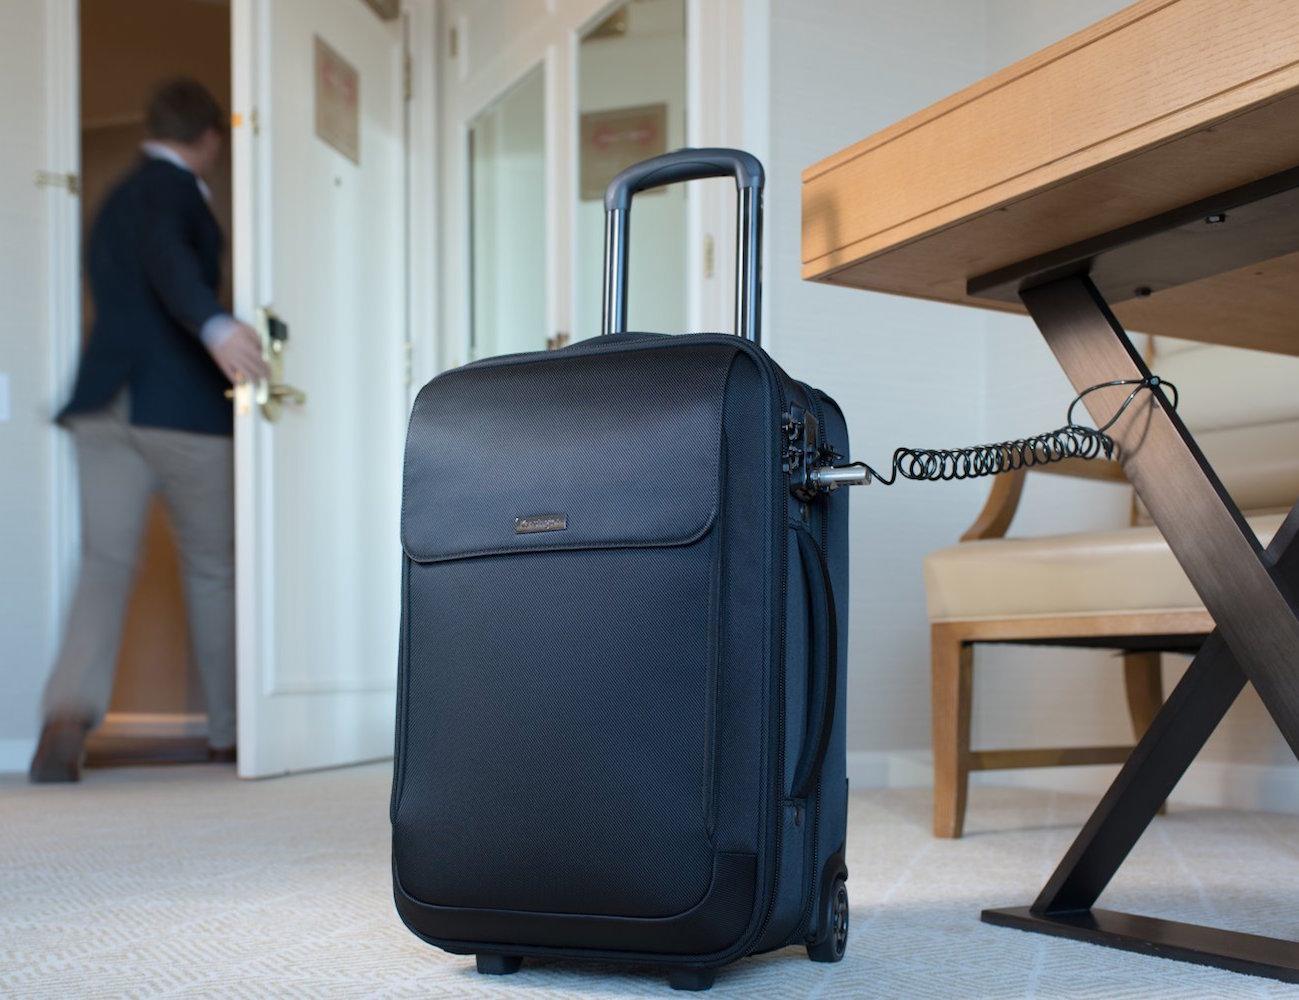 Kensington SecureTrek Bag Range for Travelers